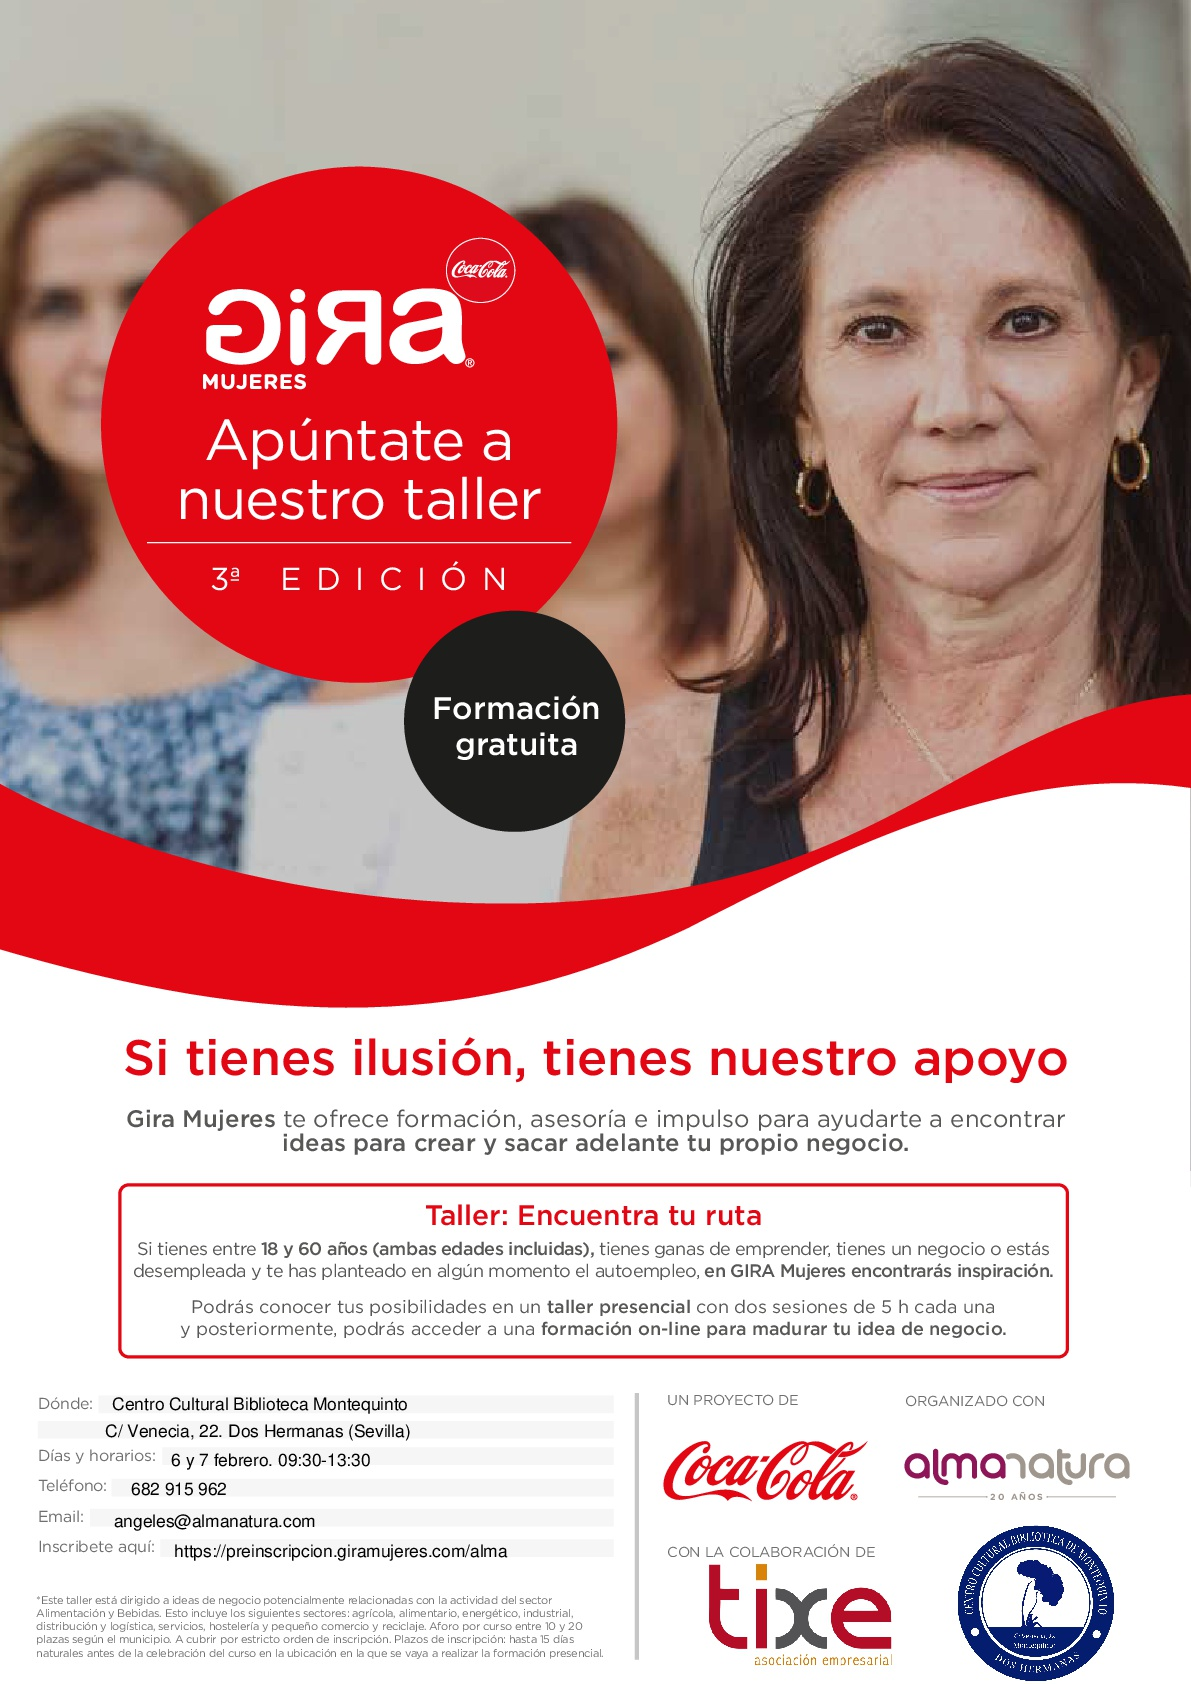 Gira Mujeres Coca-Cola en Dos Hermanas